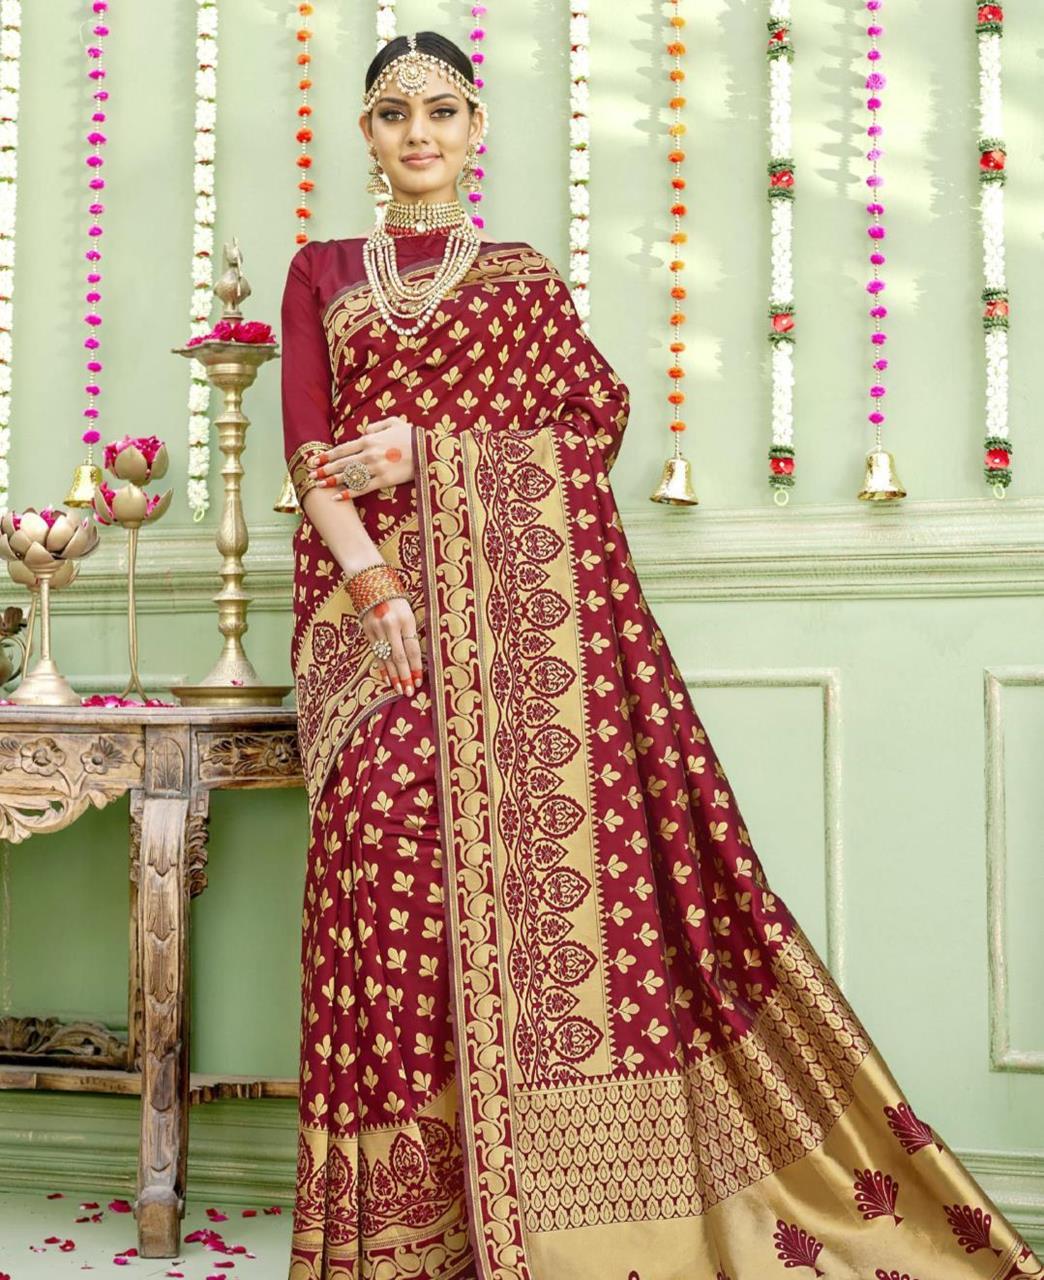 Woven Silk Saree (Sari) in Maroon